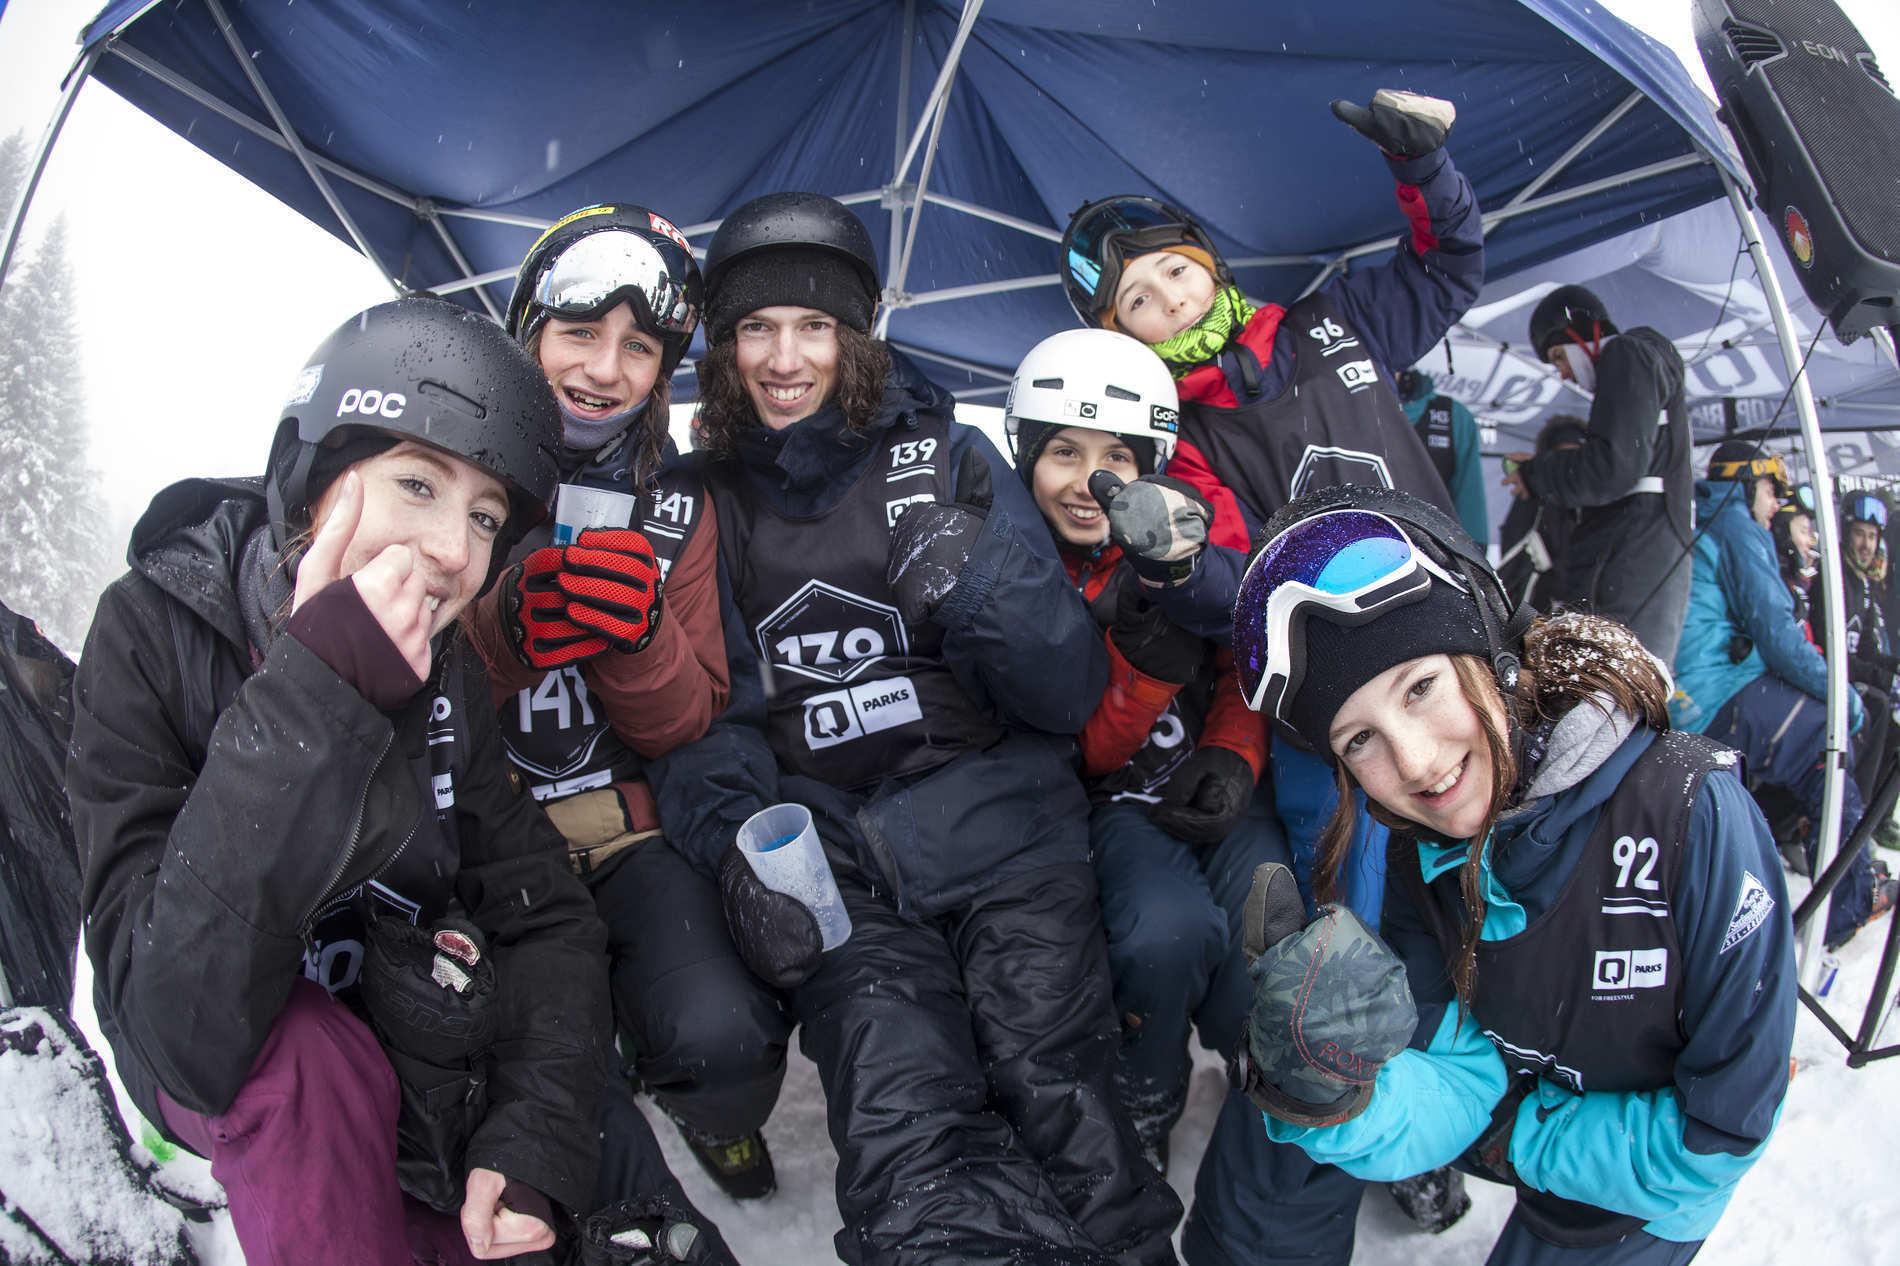 web snowpark feldberg 17 02 2018 lifestyle fs sb martin herrmann qparks 7